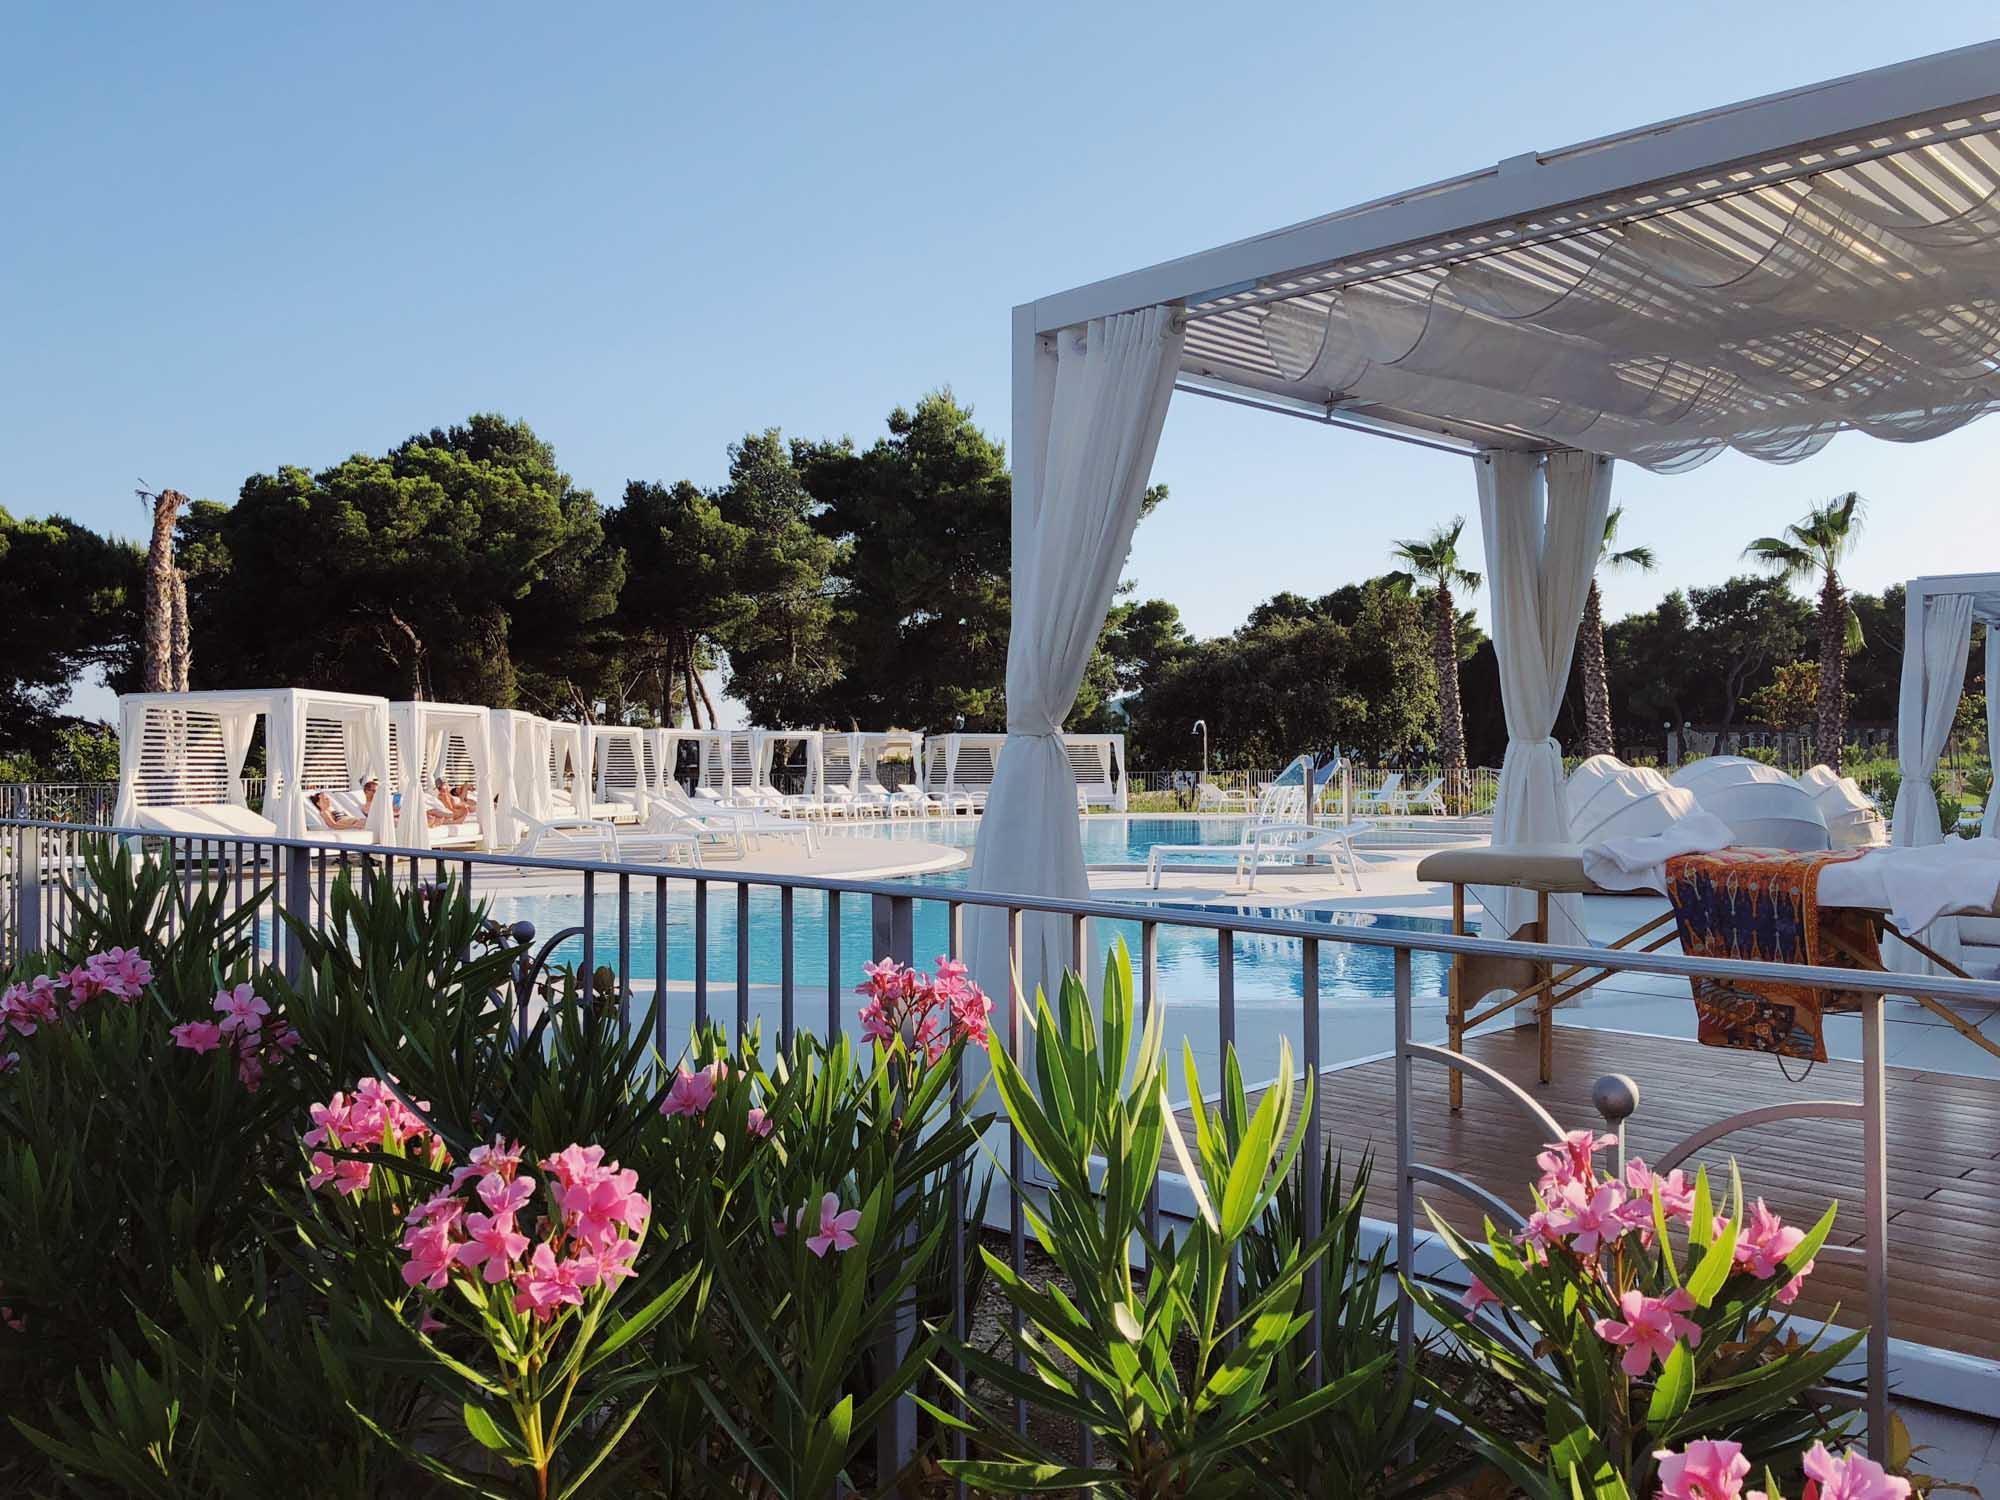 Hotel Jure, Amadria Park, Sibenik, Croatia